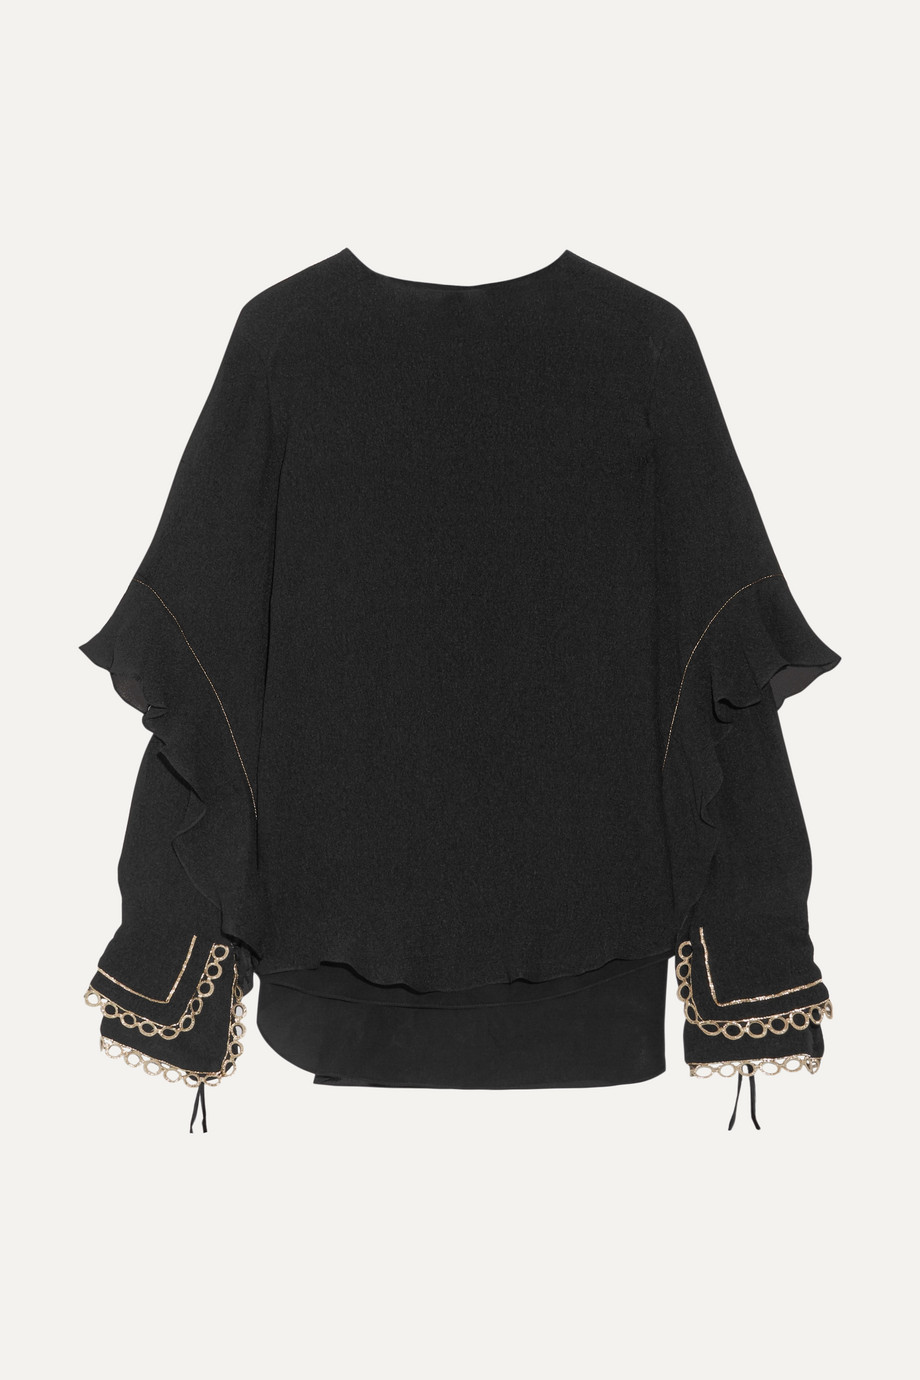 Chloé Ruffled metallic-trimmed silk-seersucker blouse